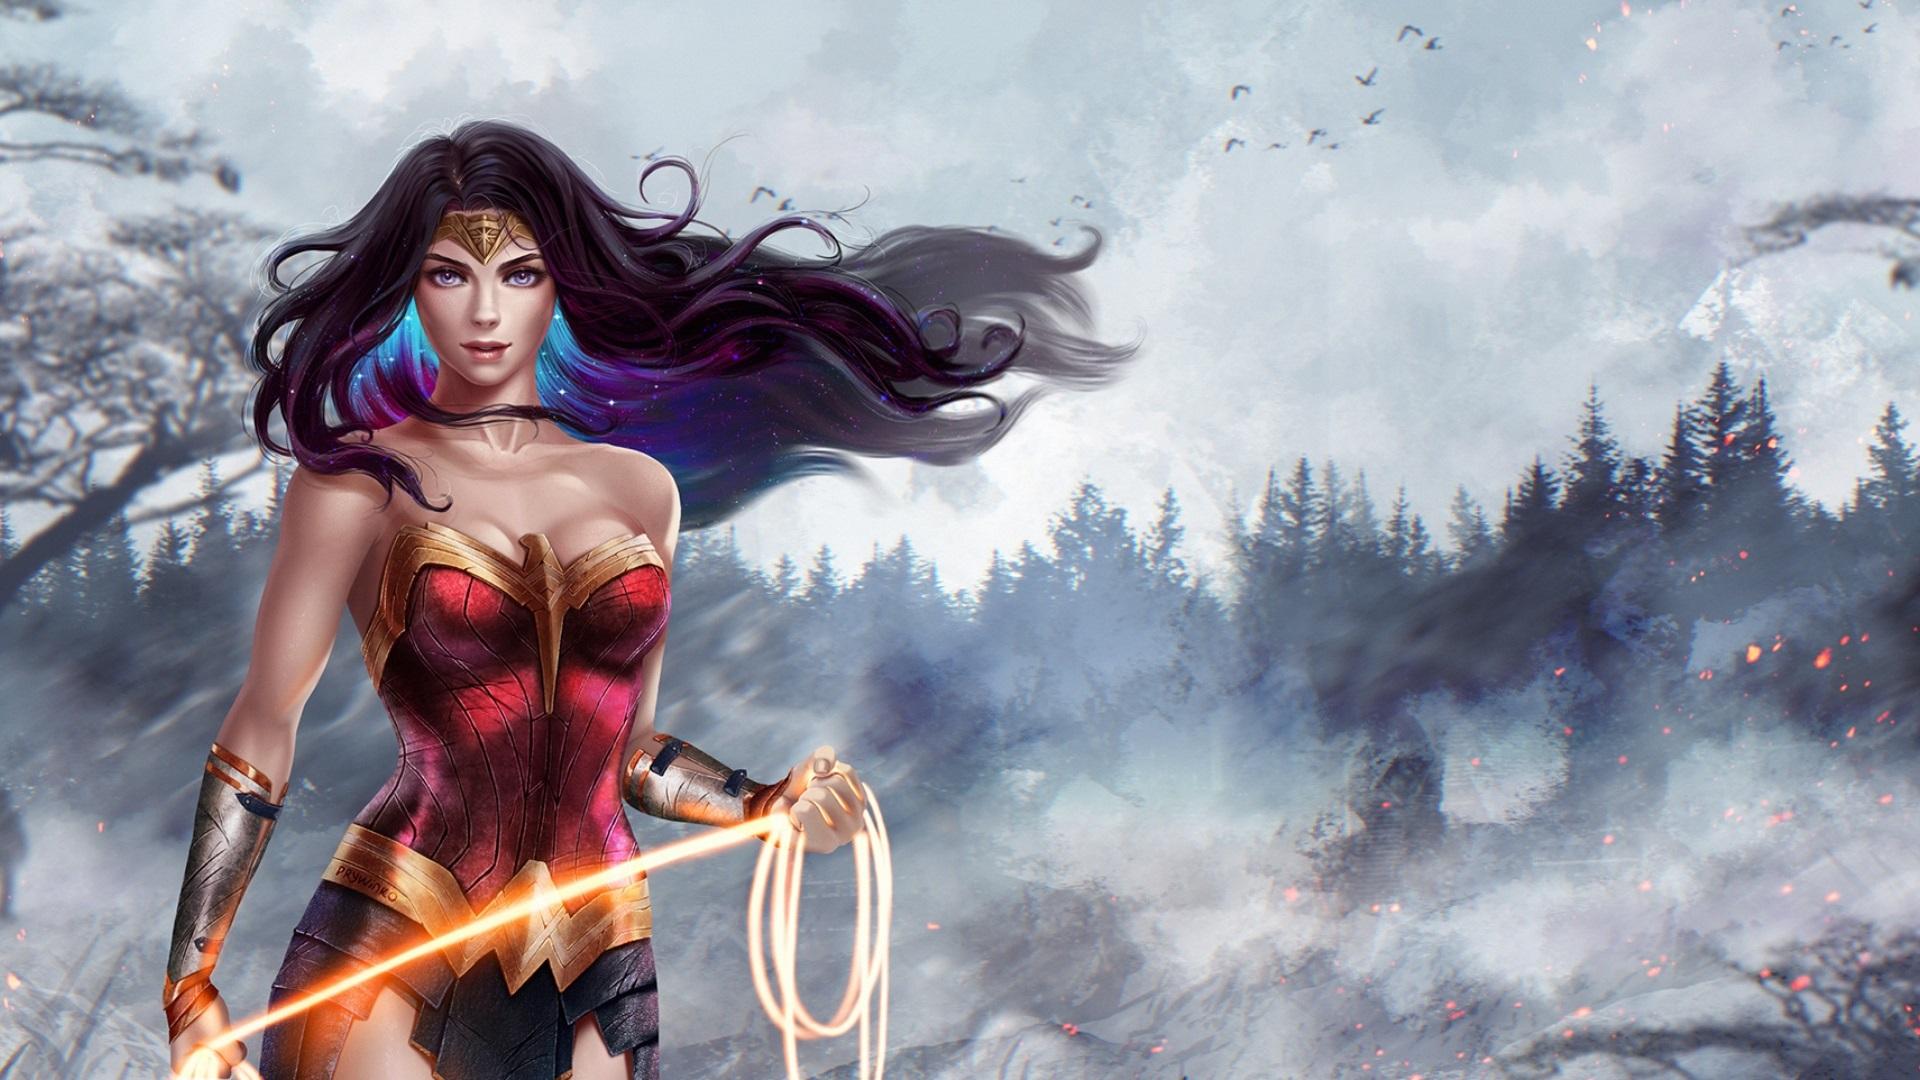 Fondos De Pantalla Wonder Woman Diana Hermosa Chica Dc